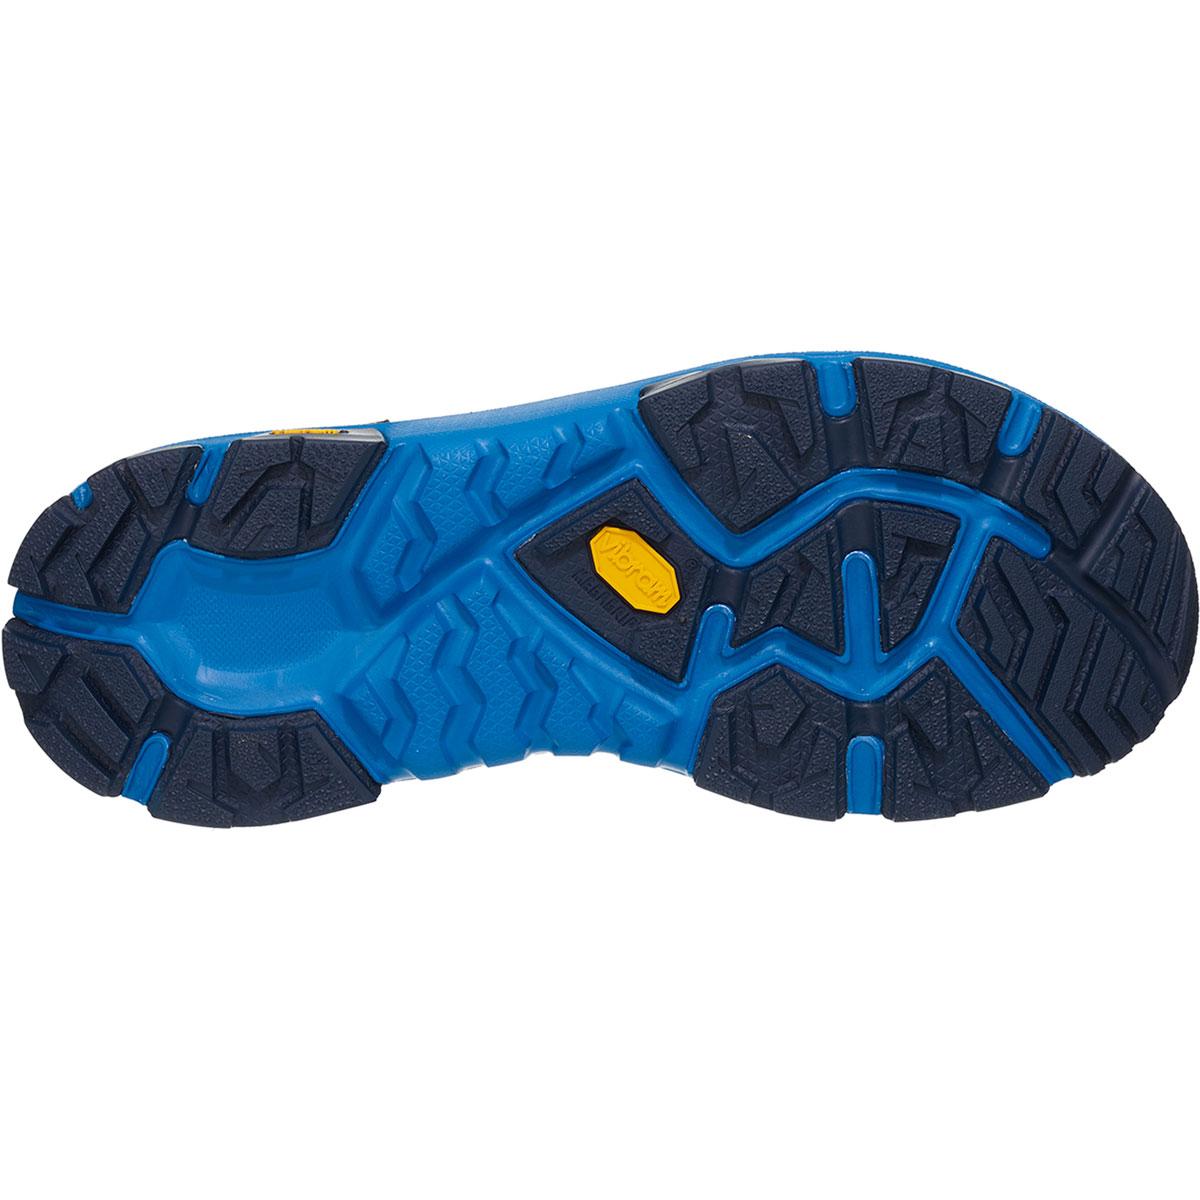 Men's Hoka One One Sky Toa Gore-Tex Trail Running Shoe - Color: Black Iris/Blue - Size: 7 - Width: Regular, Black Iris/Blue, large, image 6